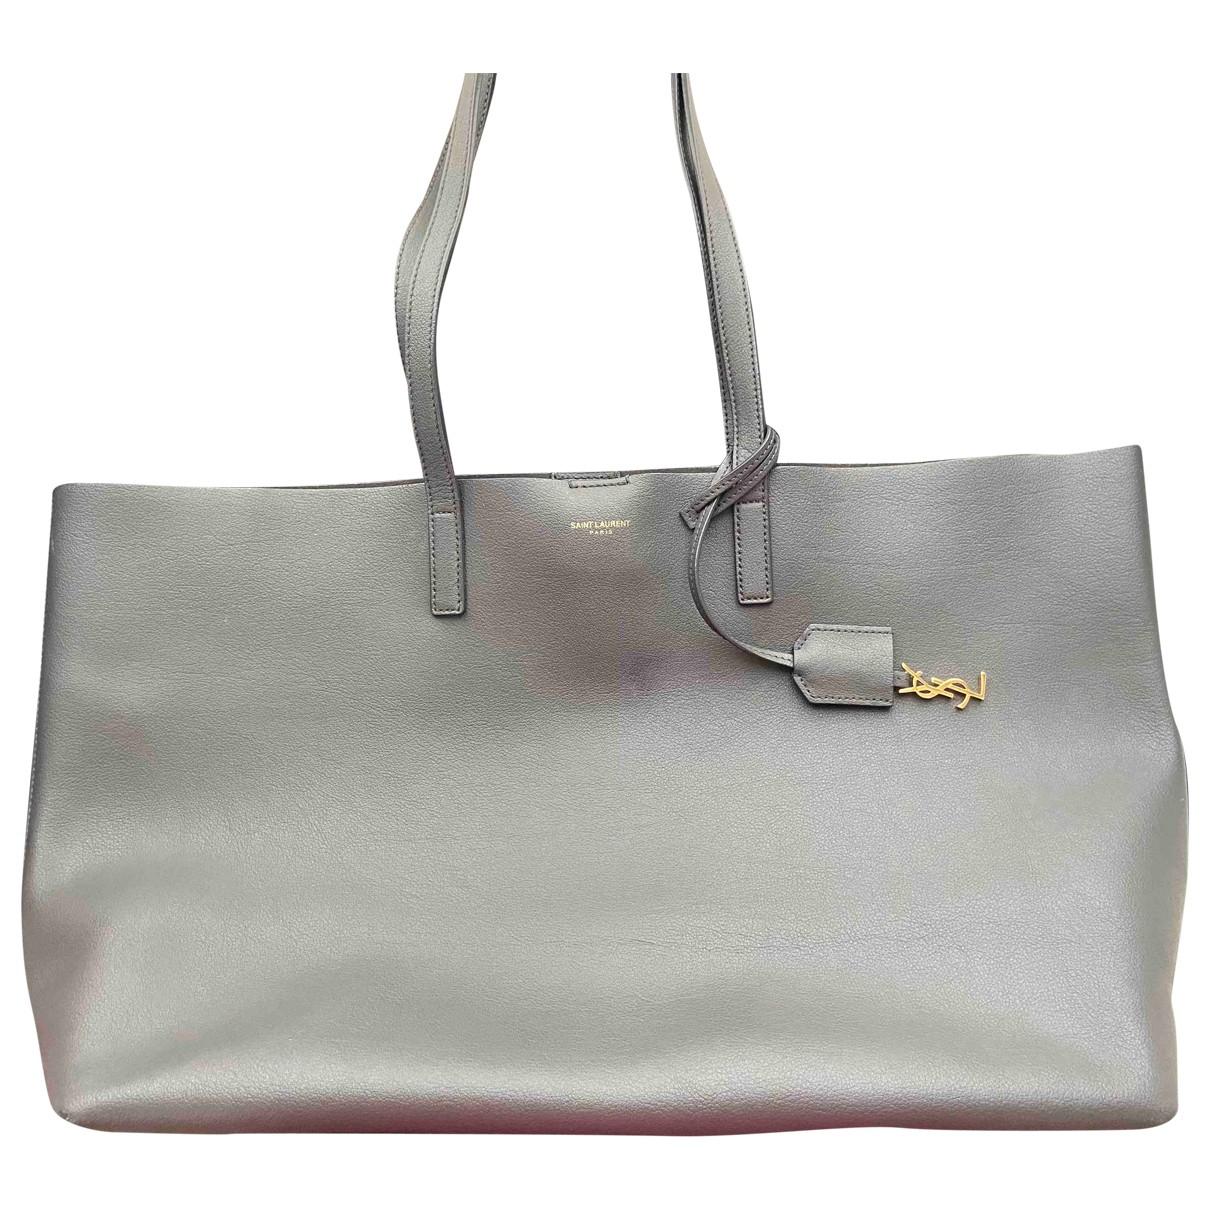 Saint Laurent Shopping Handtasche in  Grau Leder